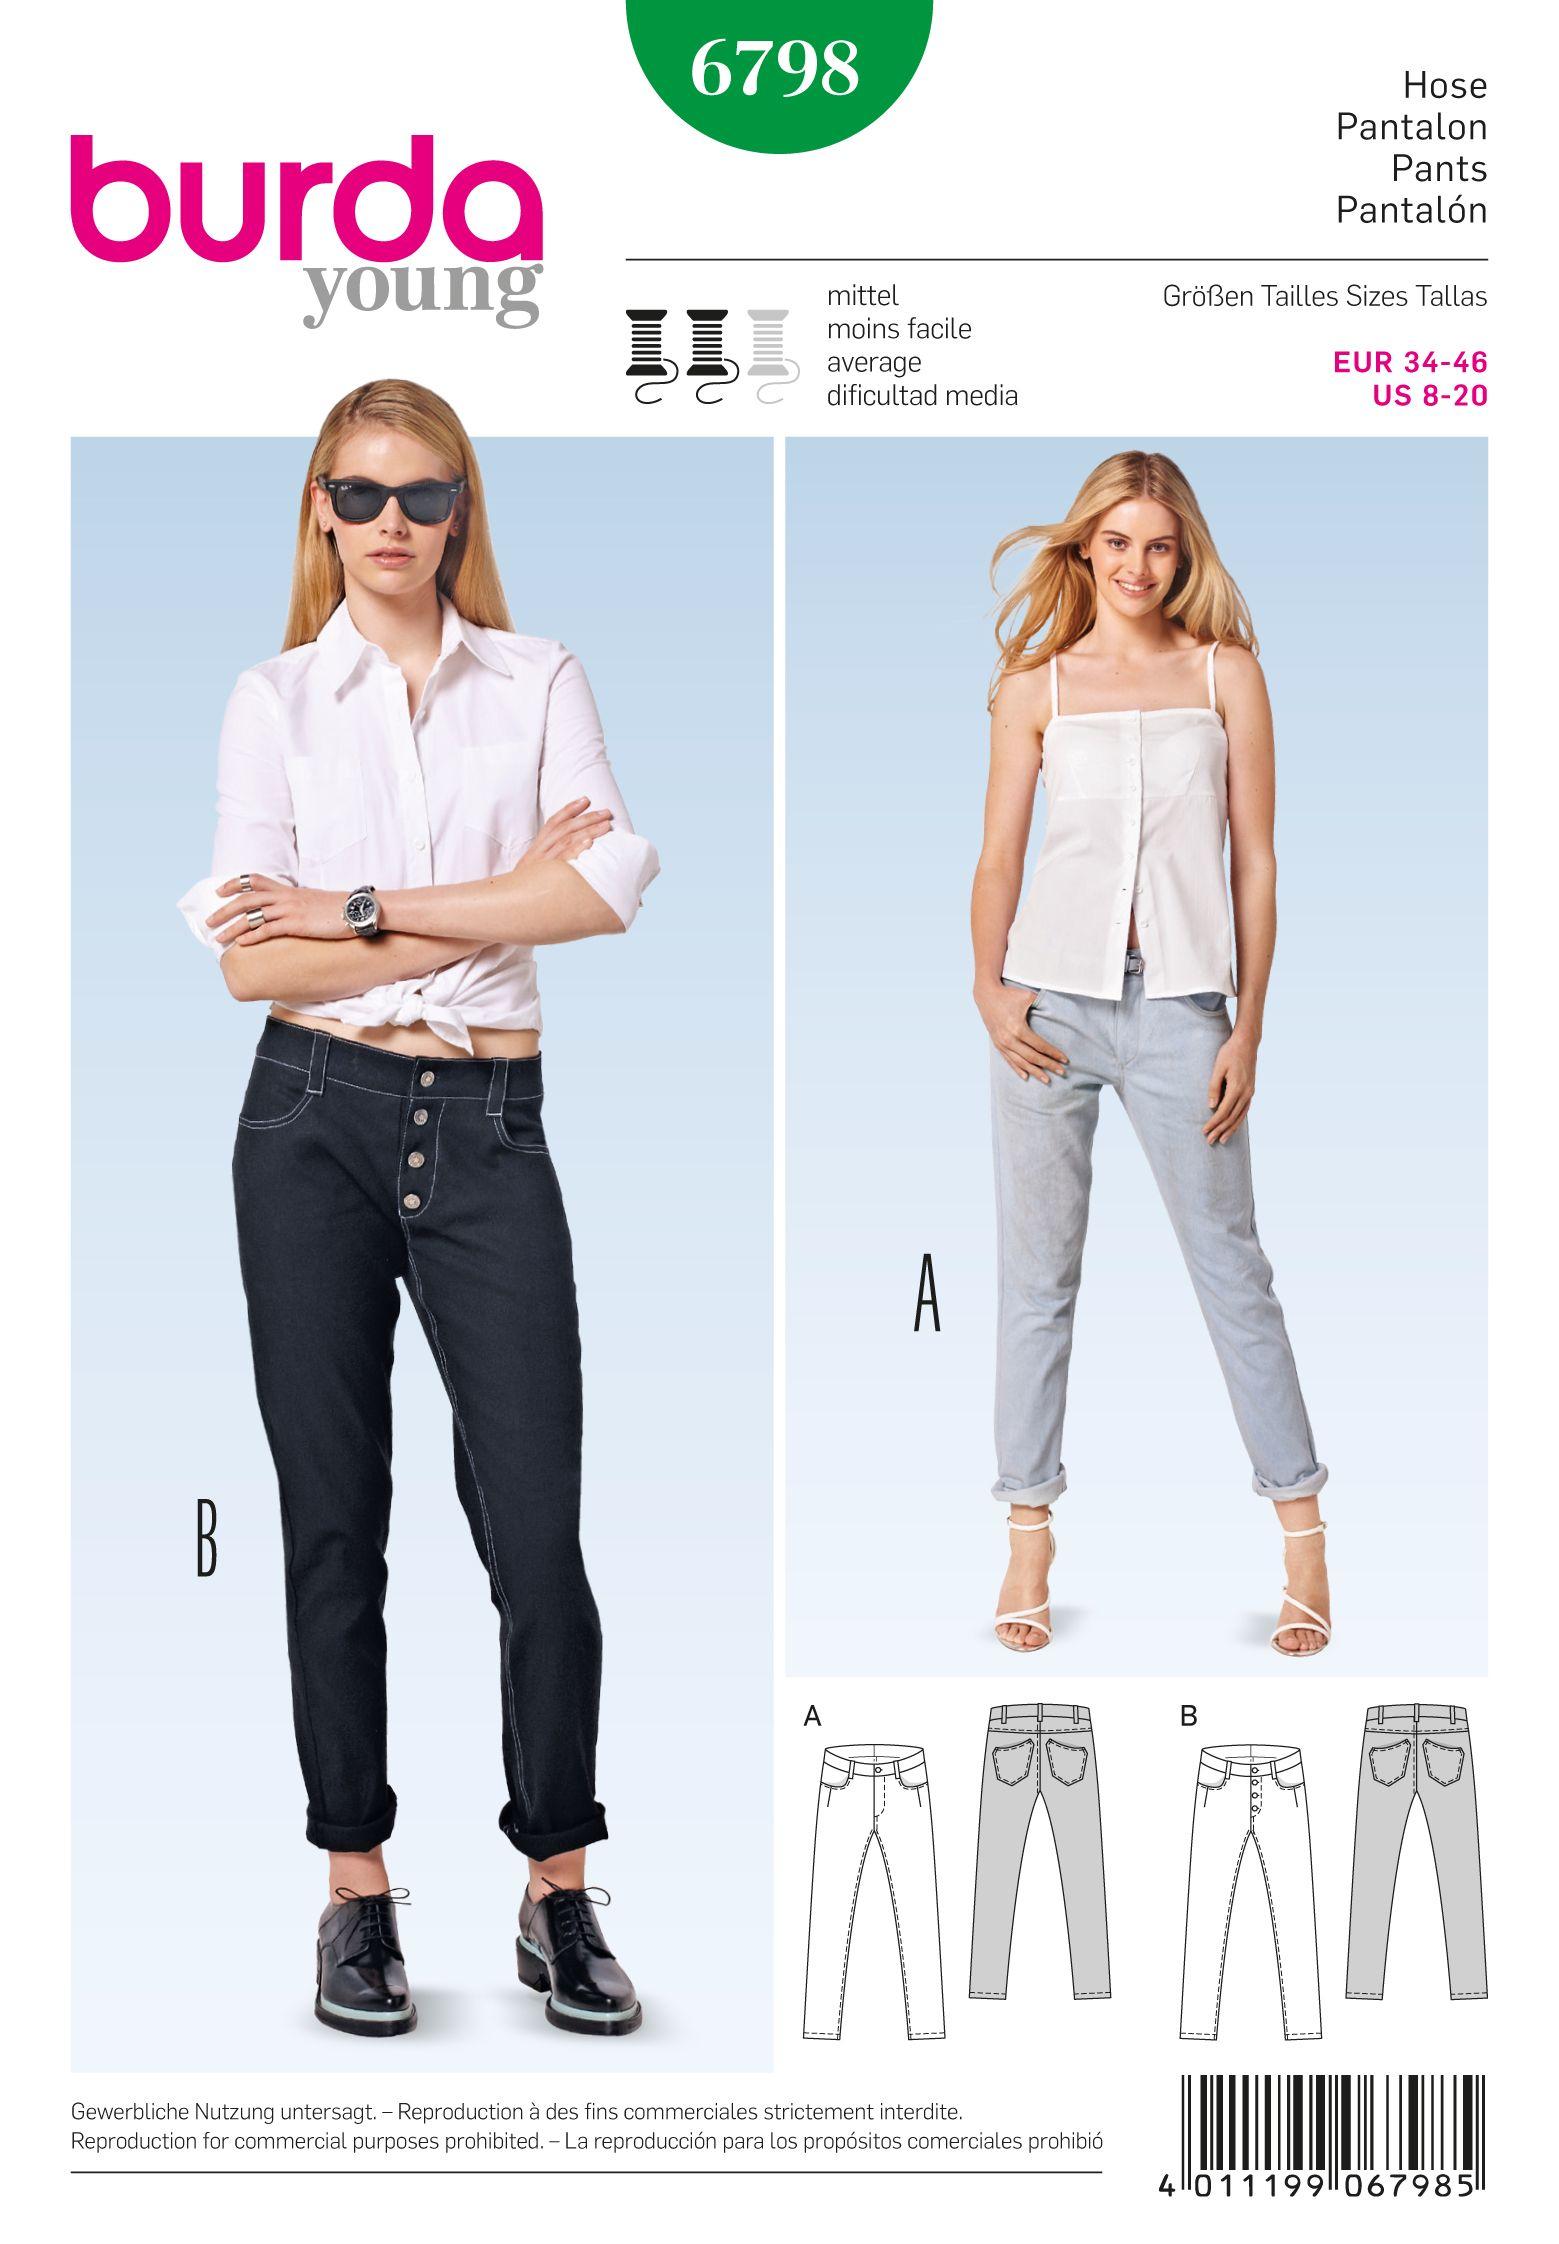 Burda Burda Style Pants, Jumpsuits 6798 | Sewing for me ...